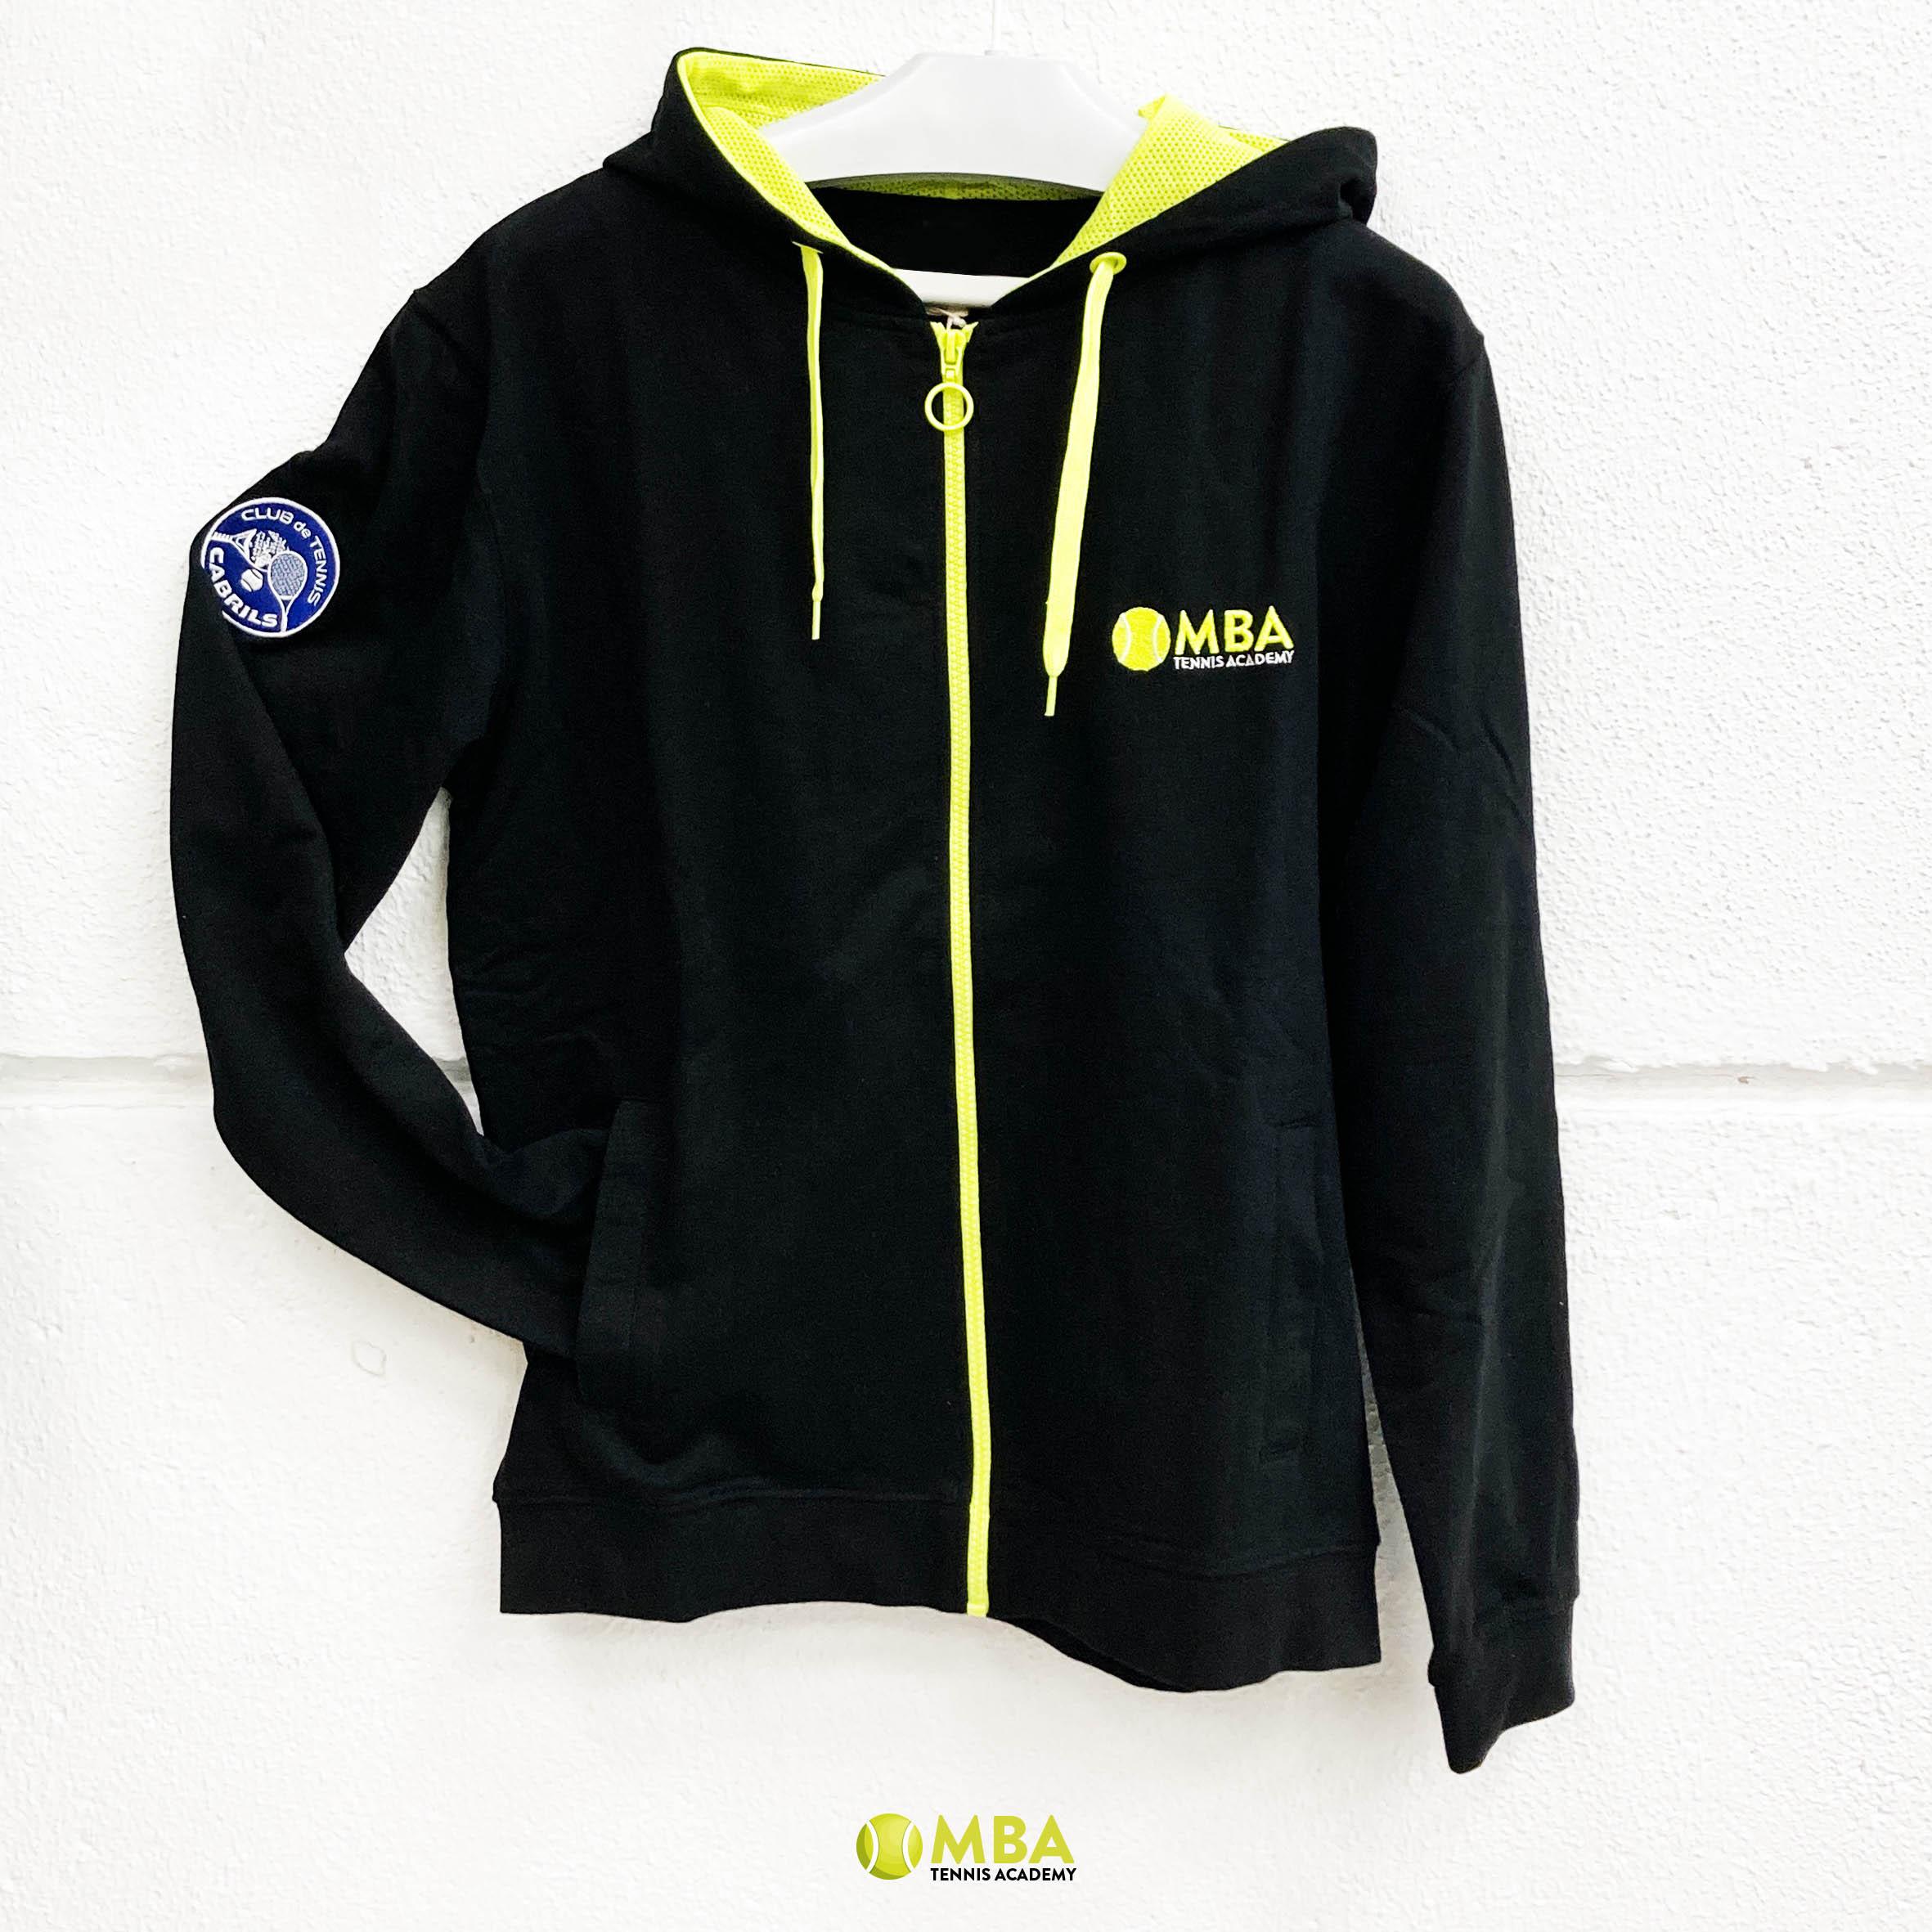 MBA-Tennis-Academy-sudadera-cremallera-1